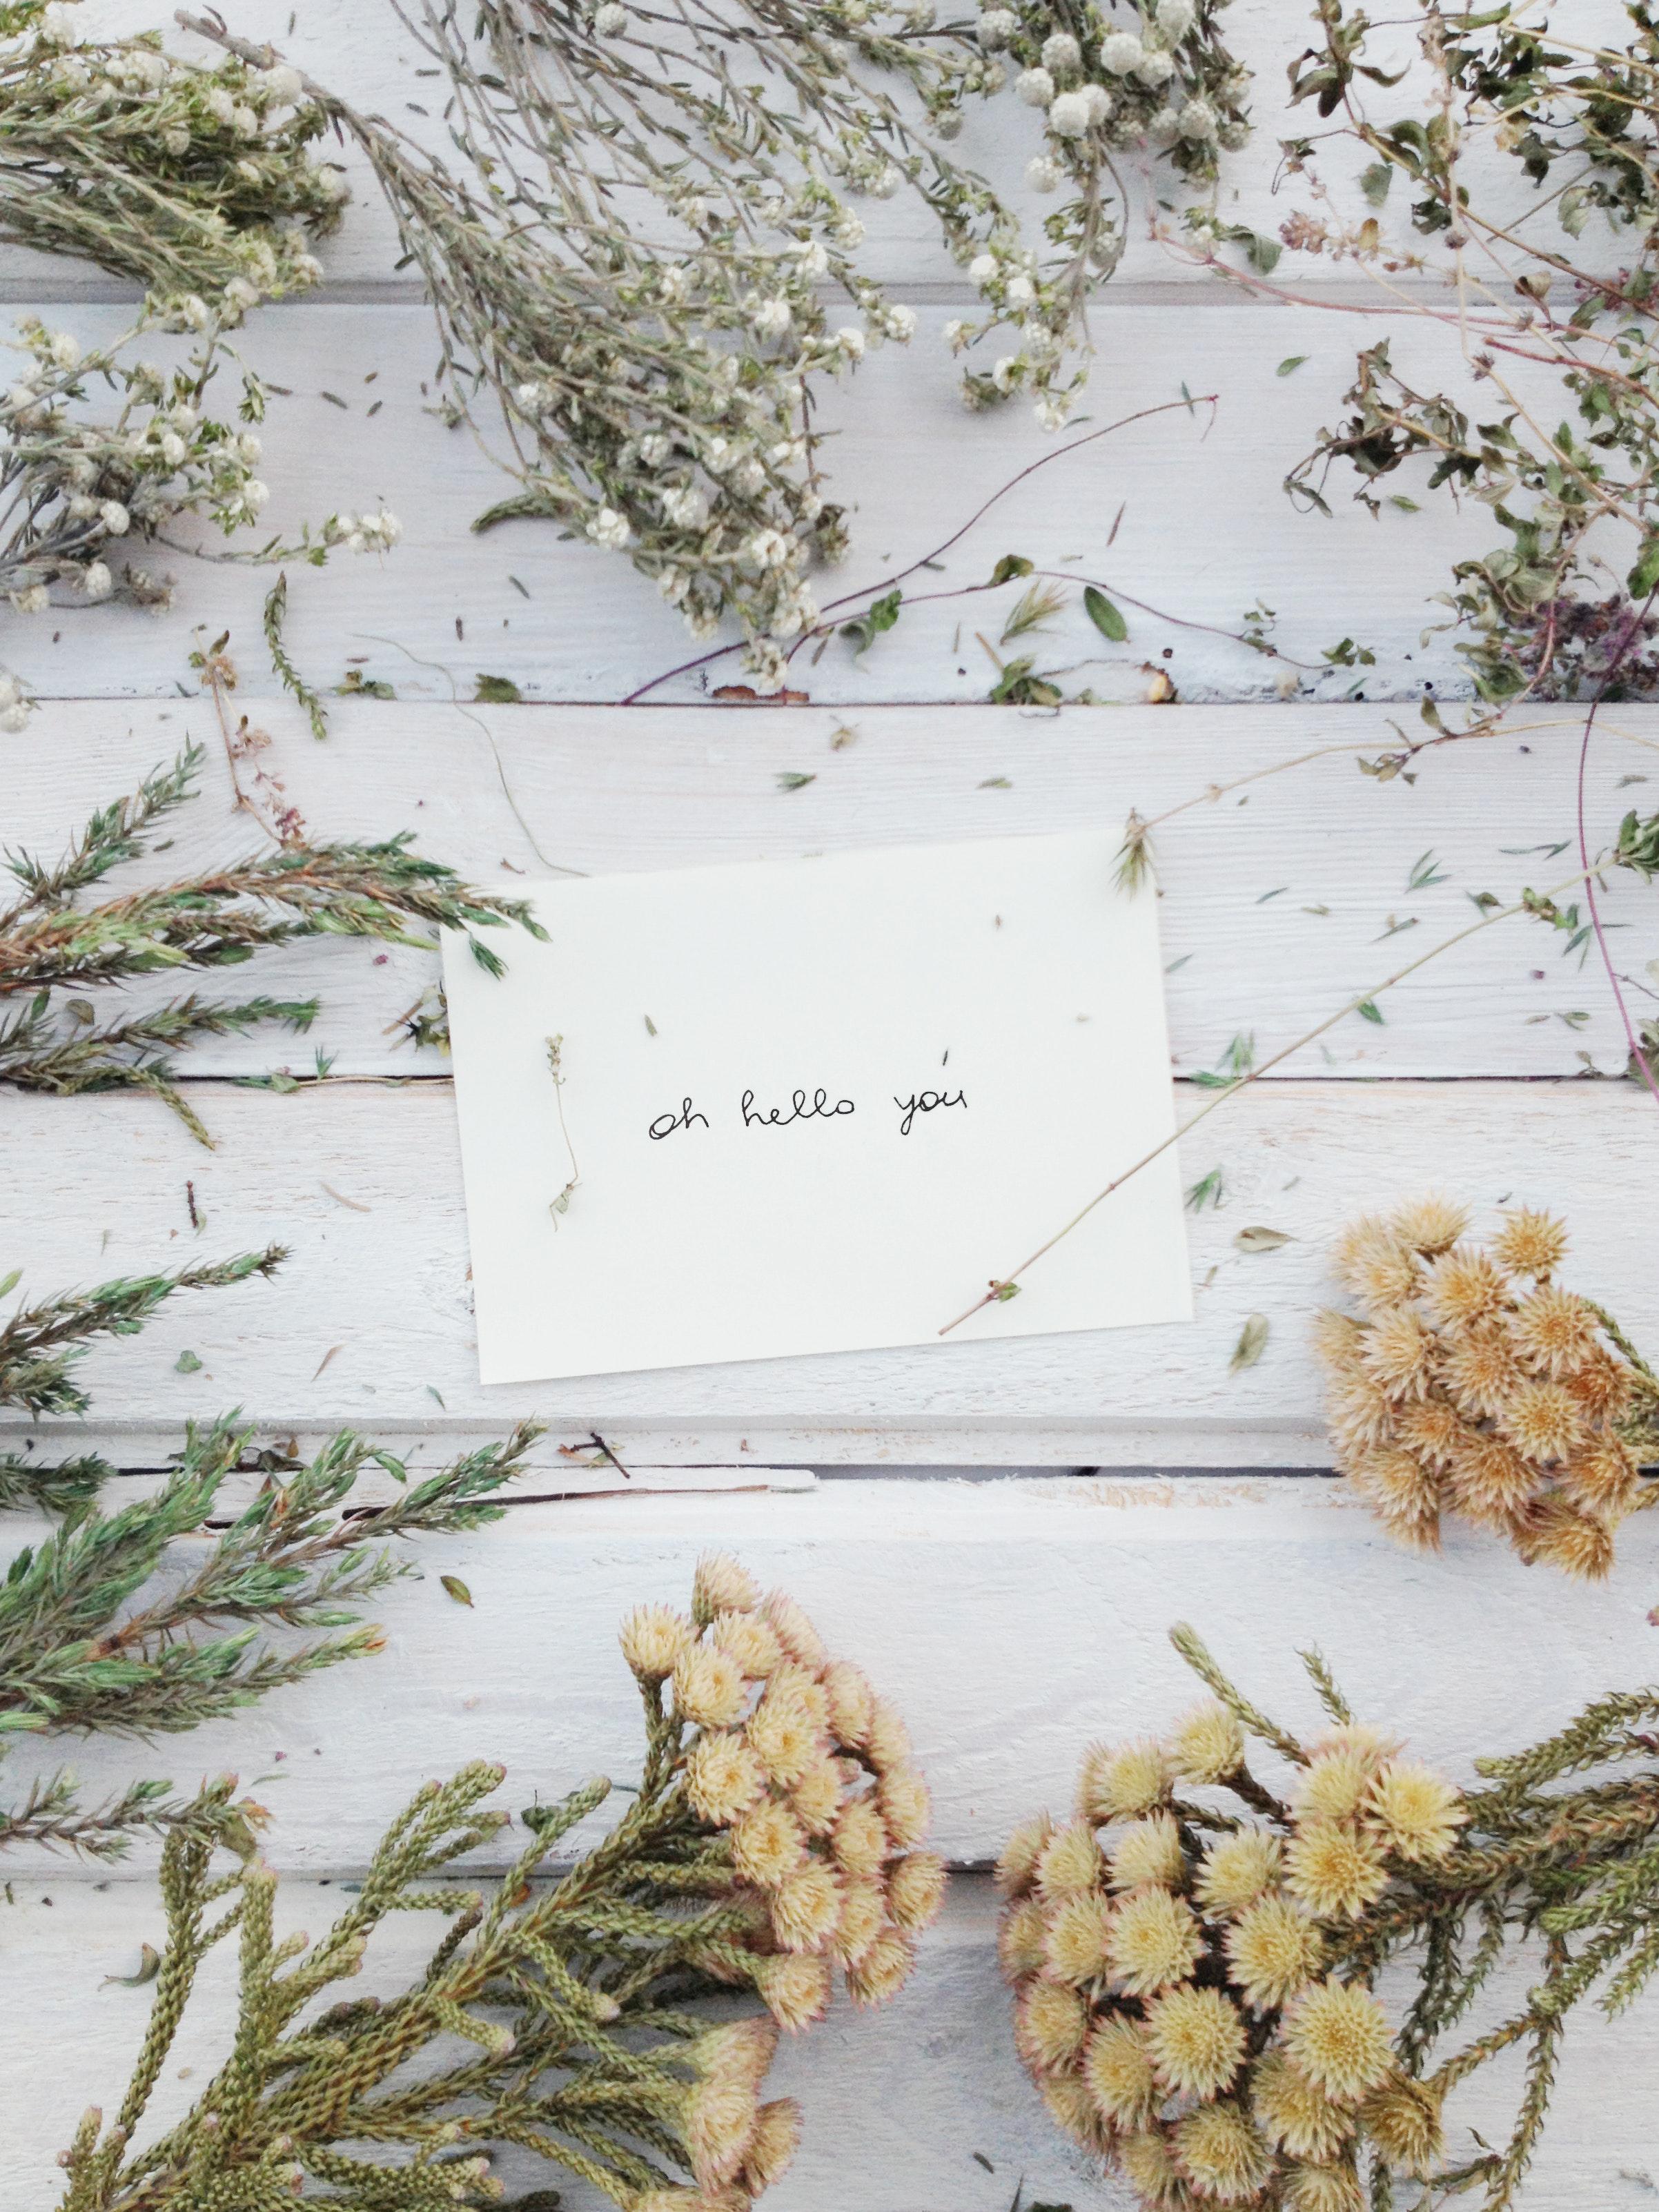 Goldenseal for Winter maladies